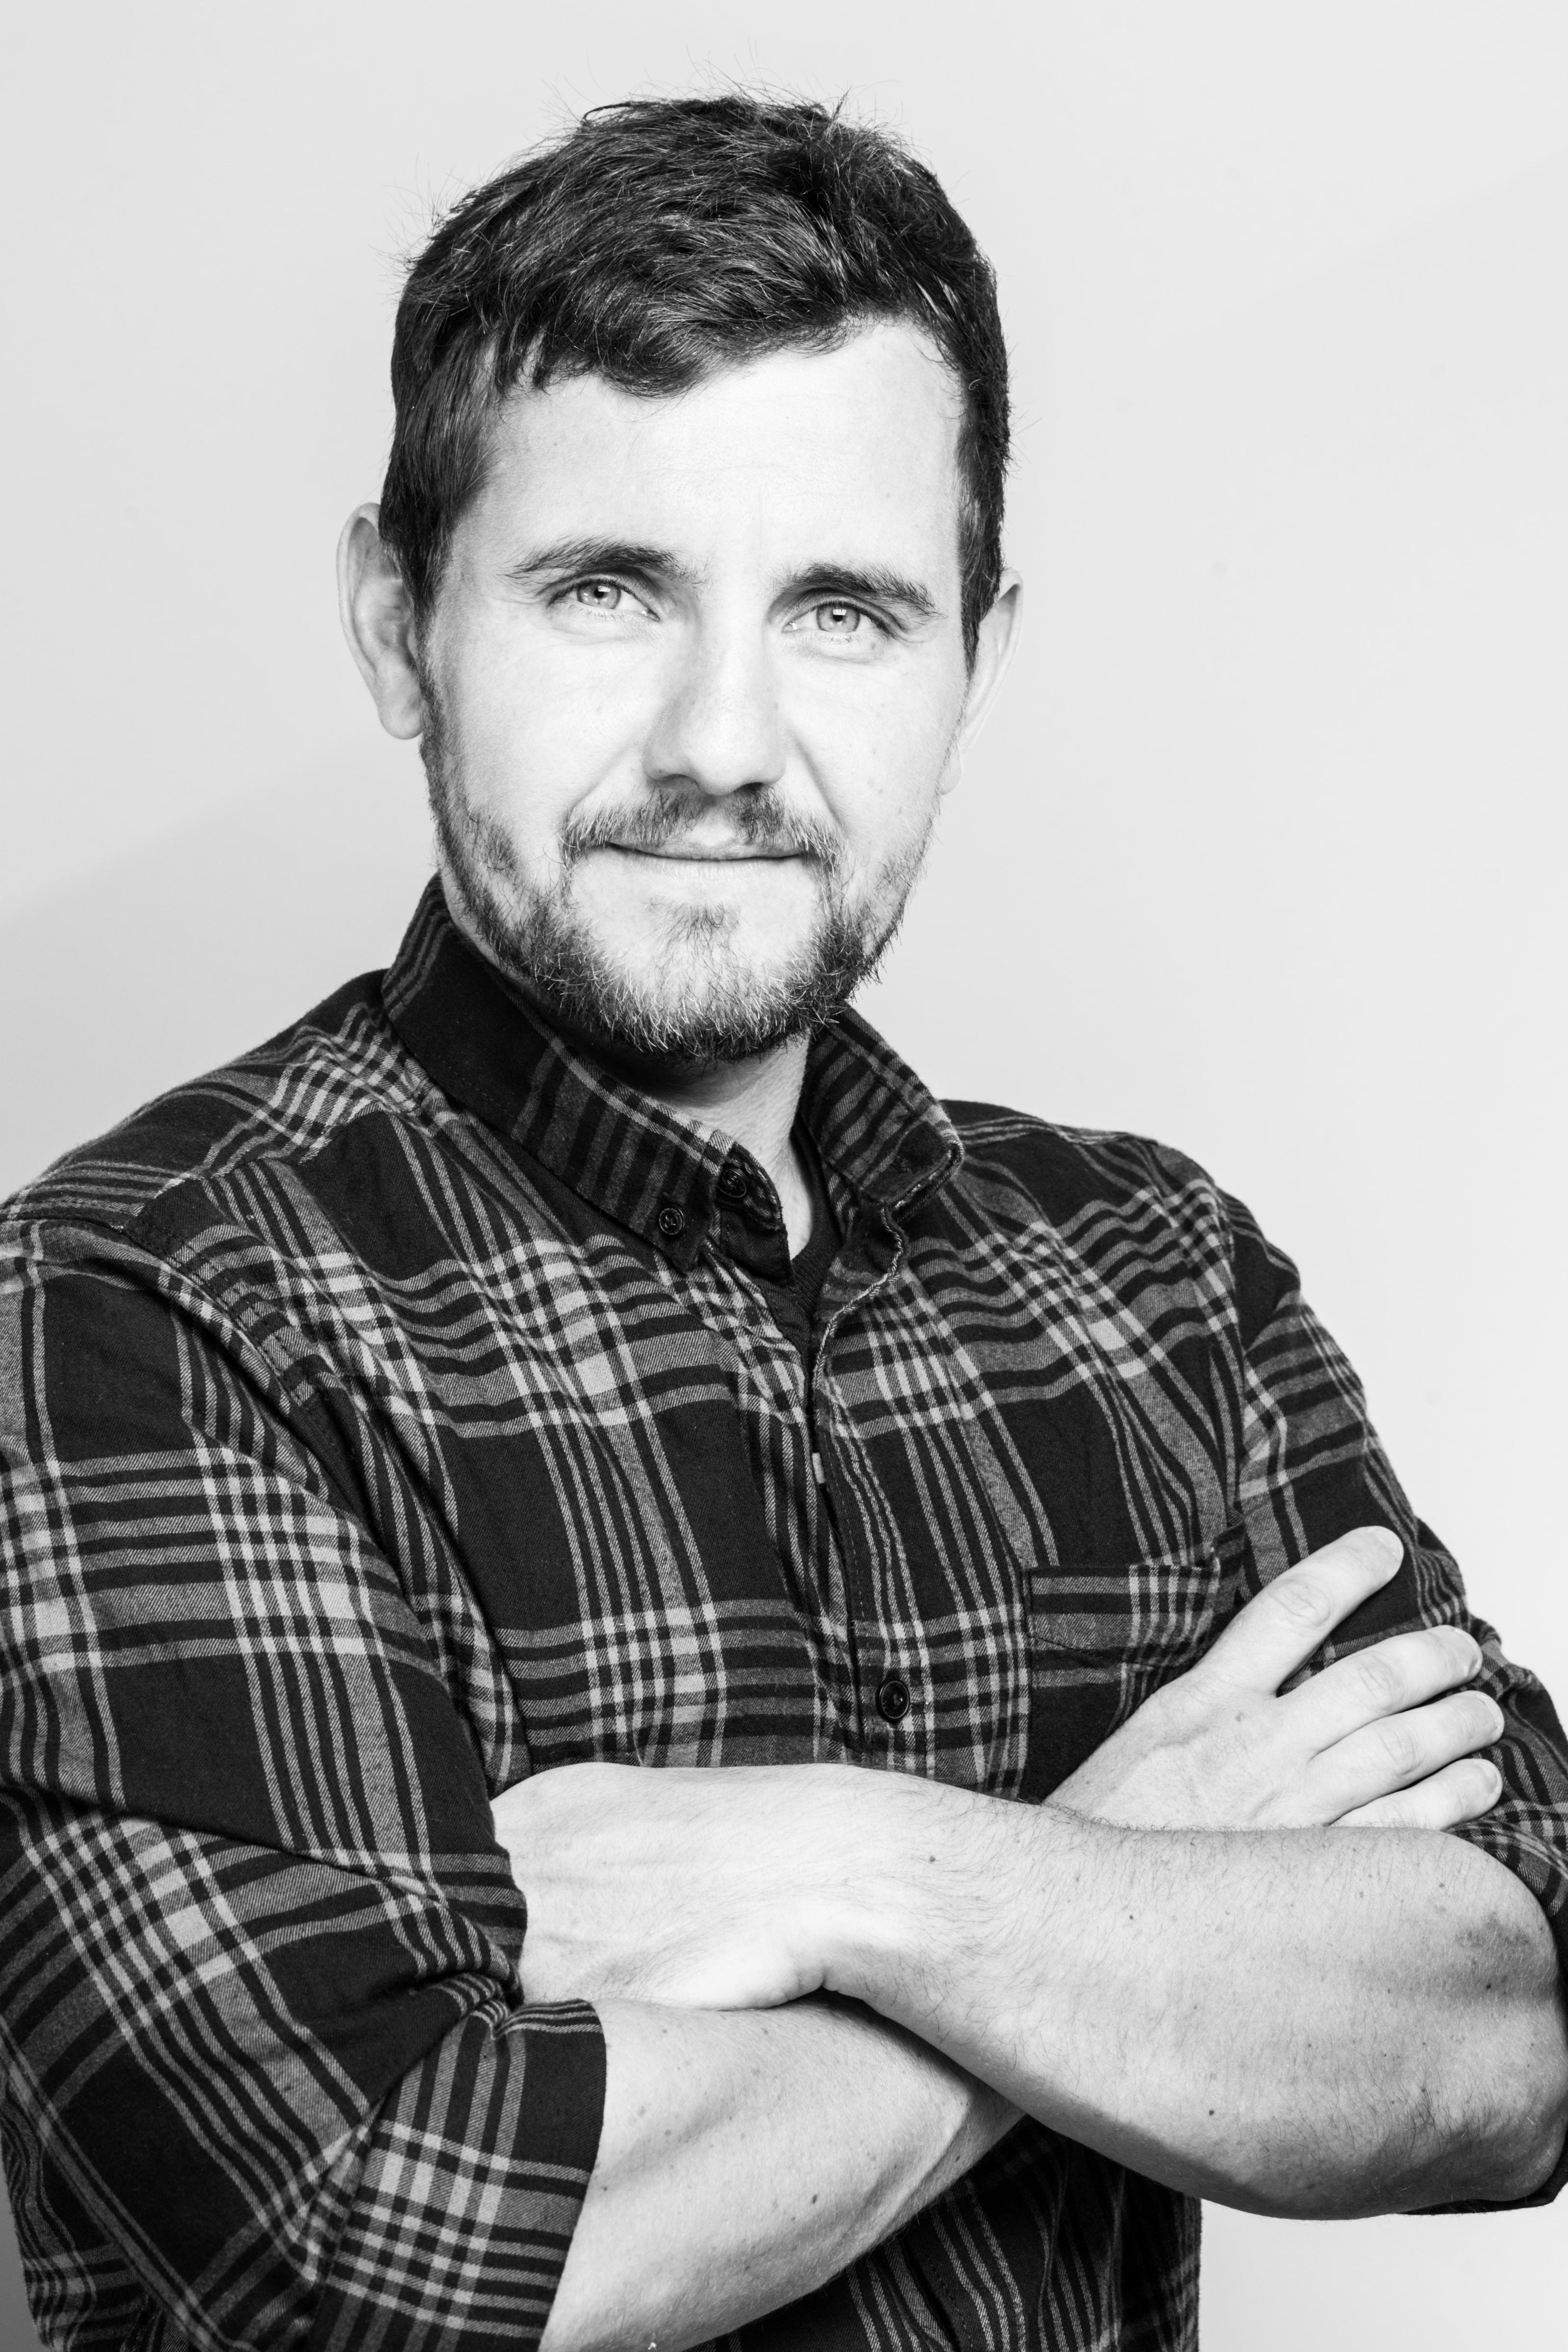 Roberto Swarovsky